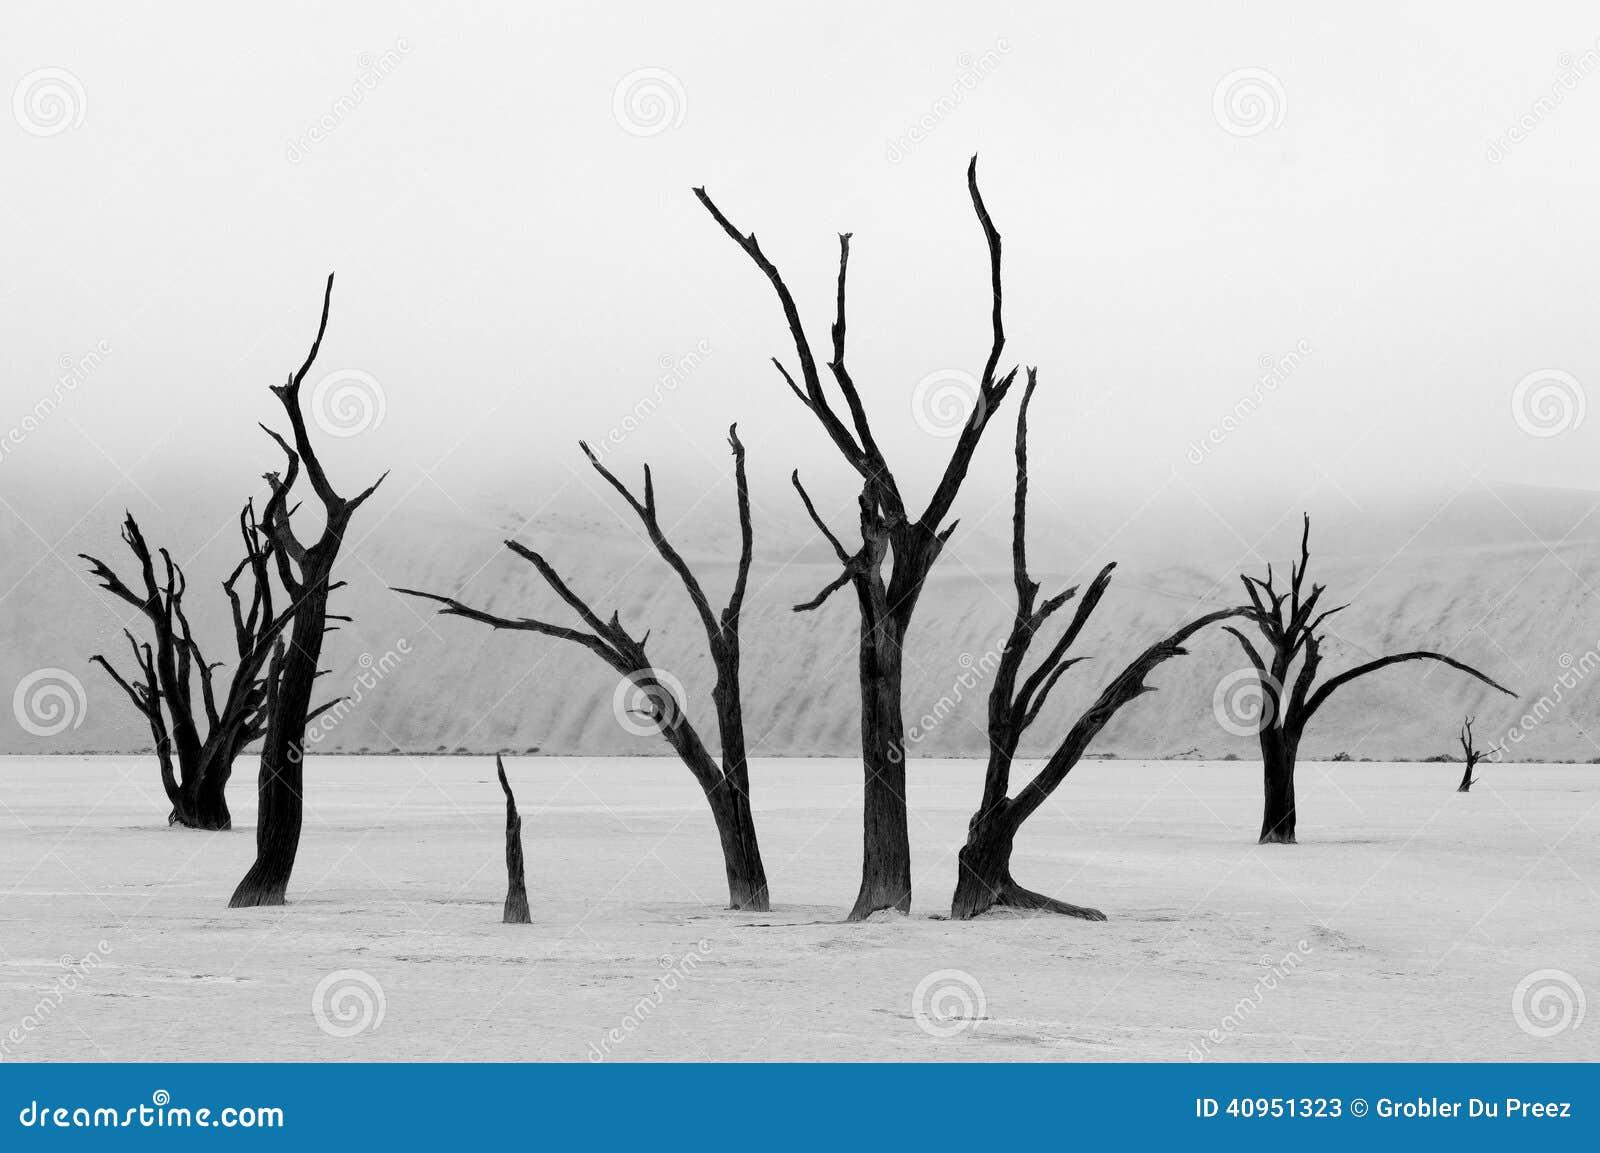 Tree skeletons in monochrome, Deadvlei, Namibia